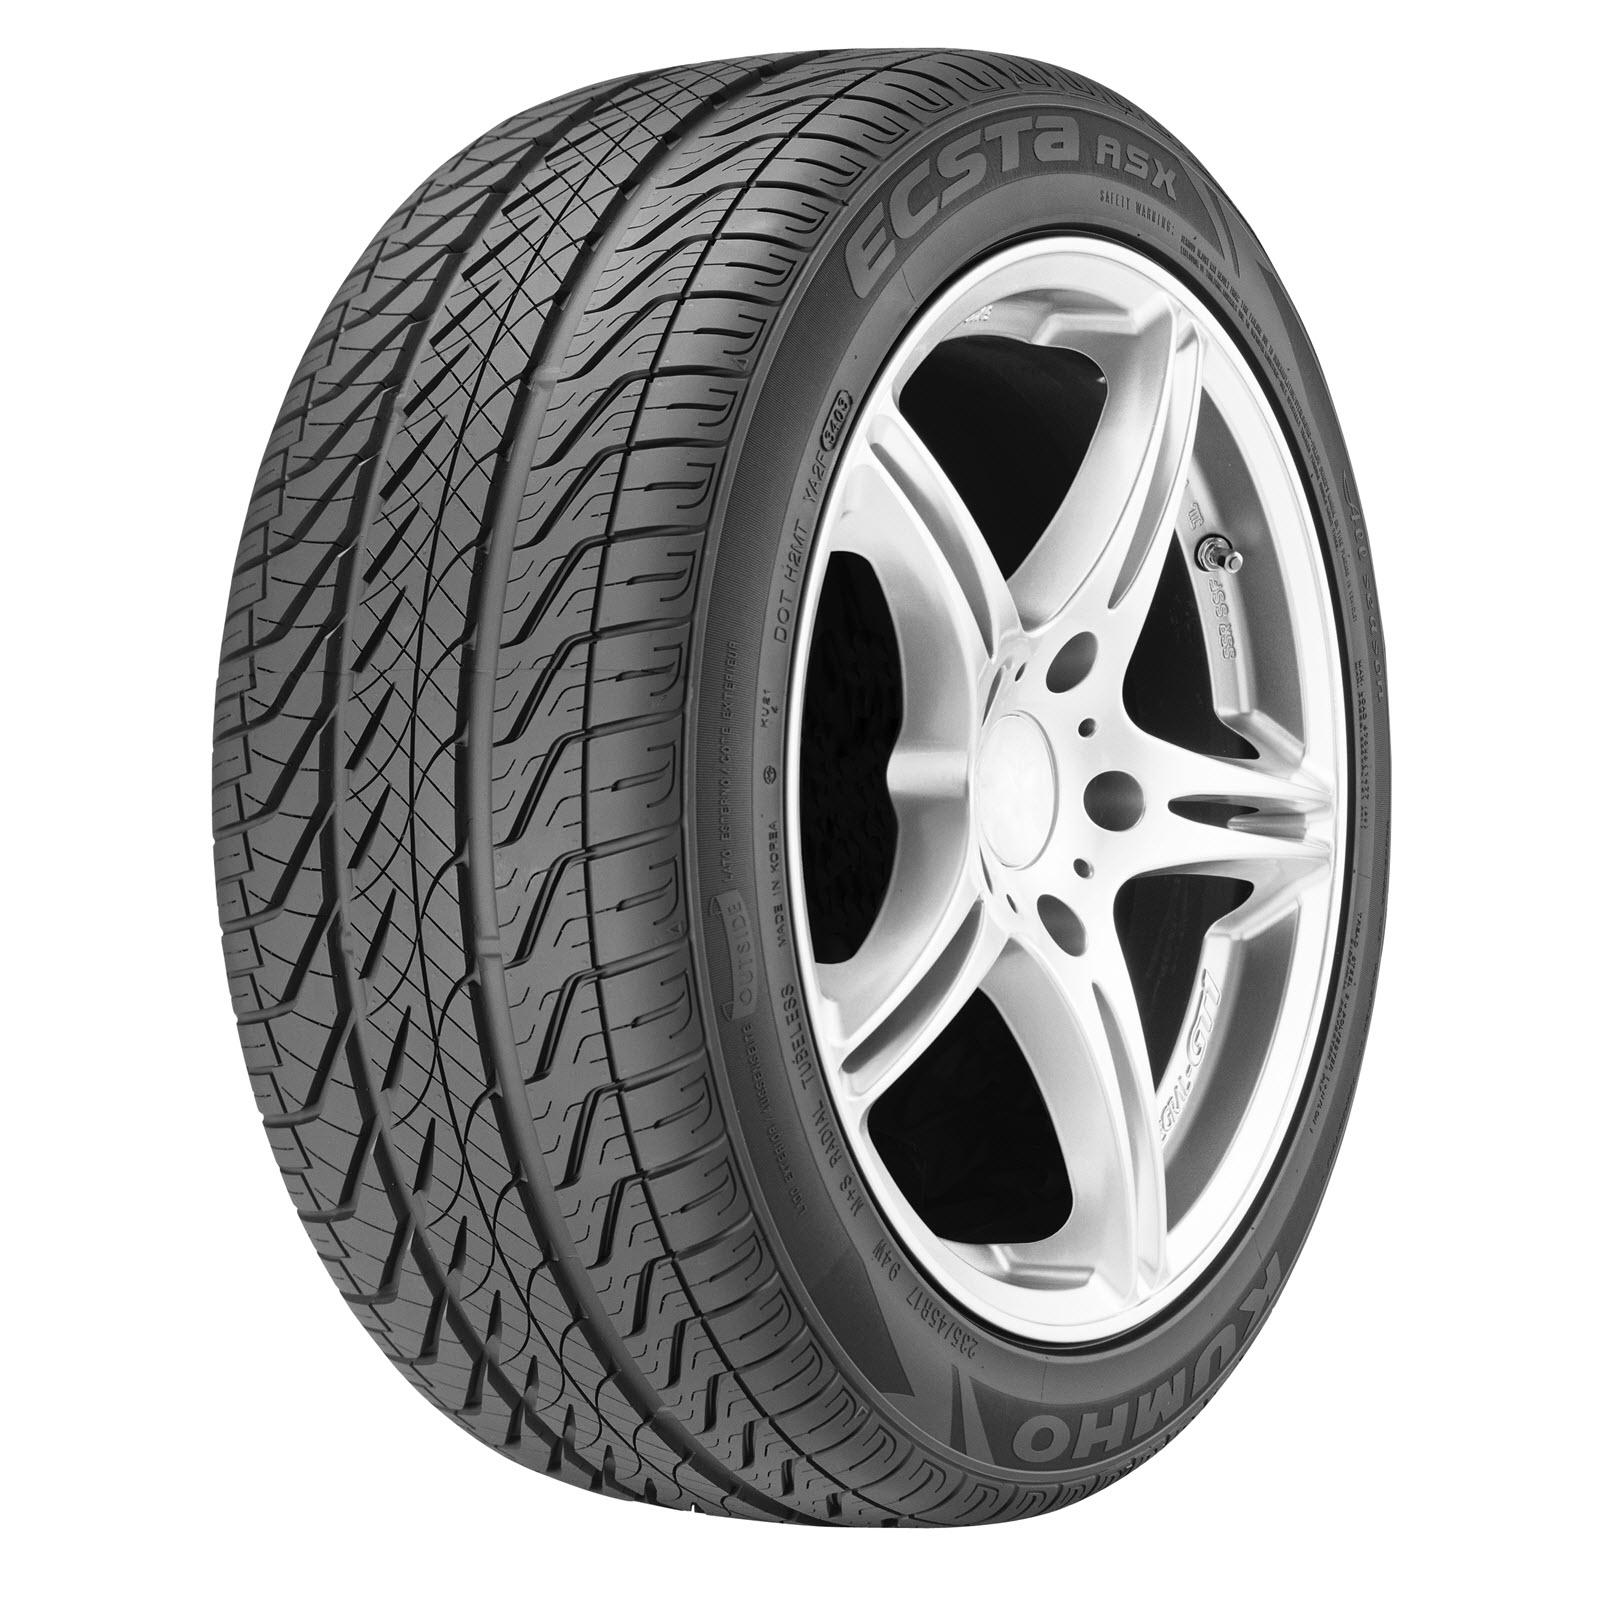 Kumho Ecsta ASX 205/50R17 93W BW All Season Tire